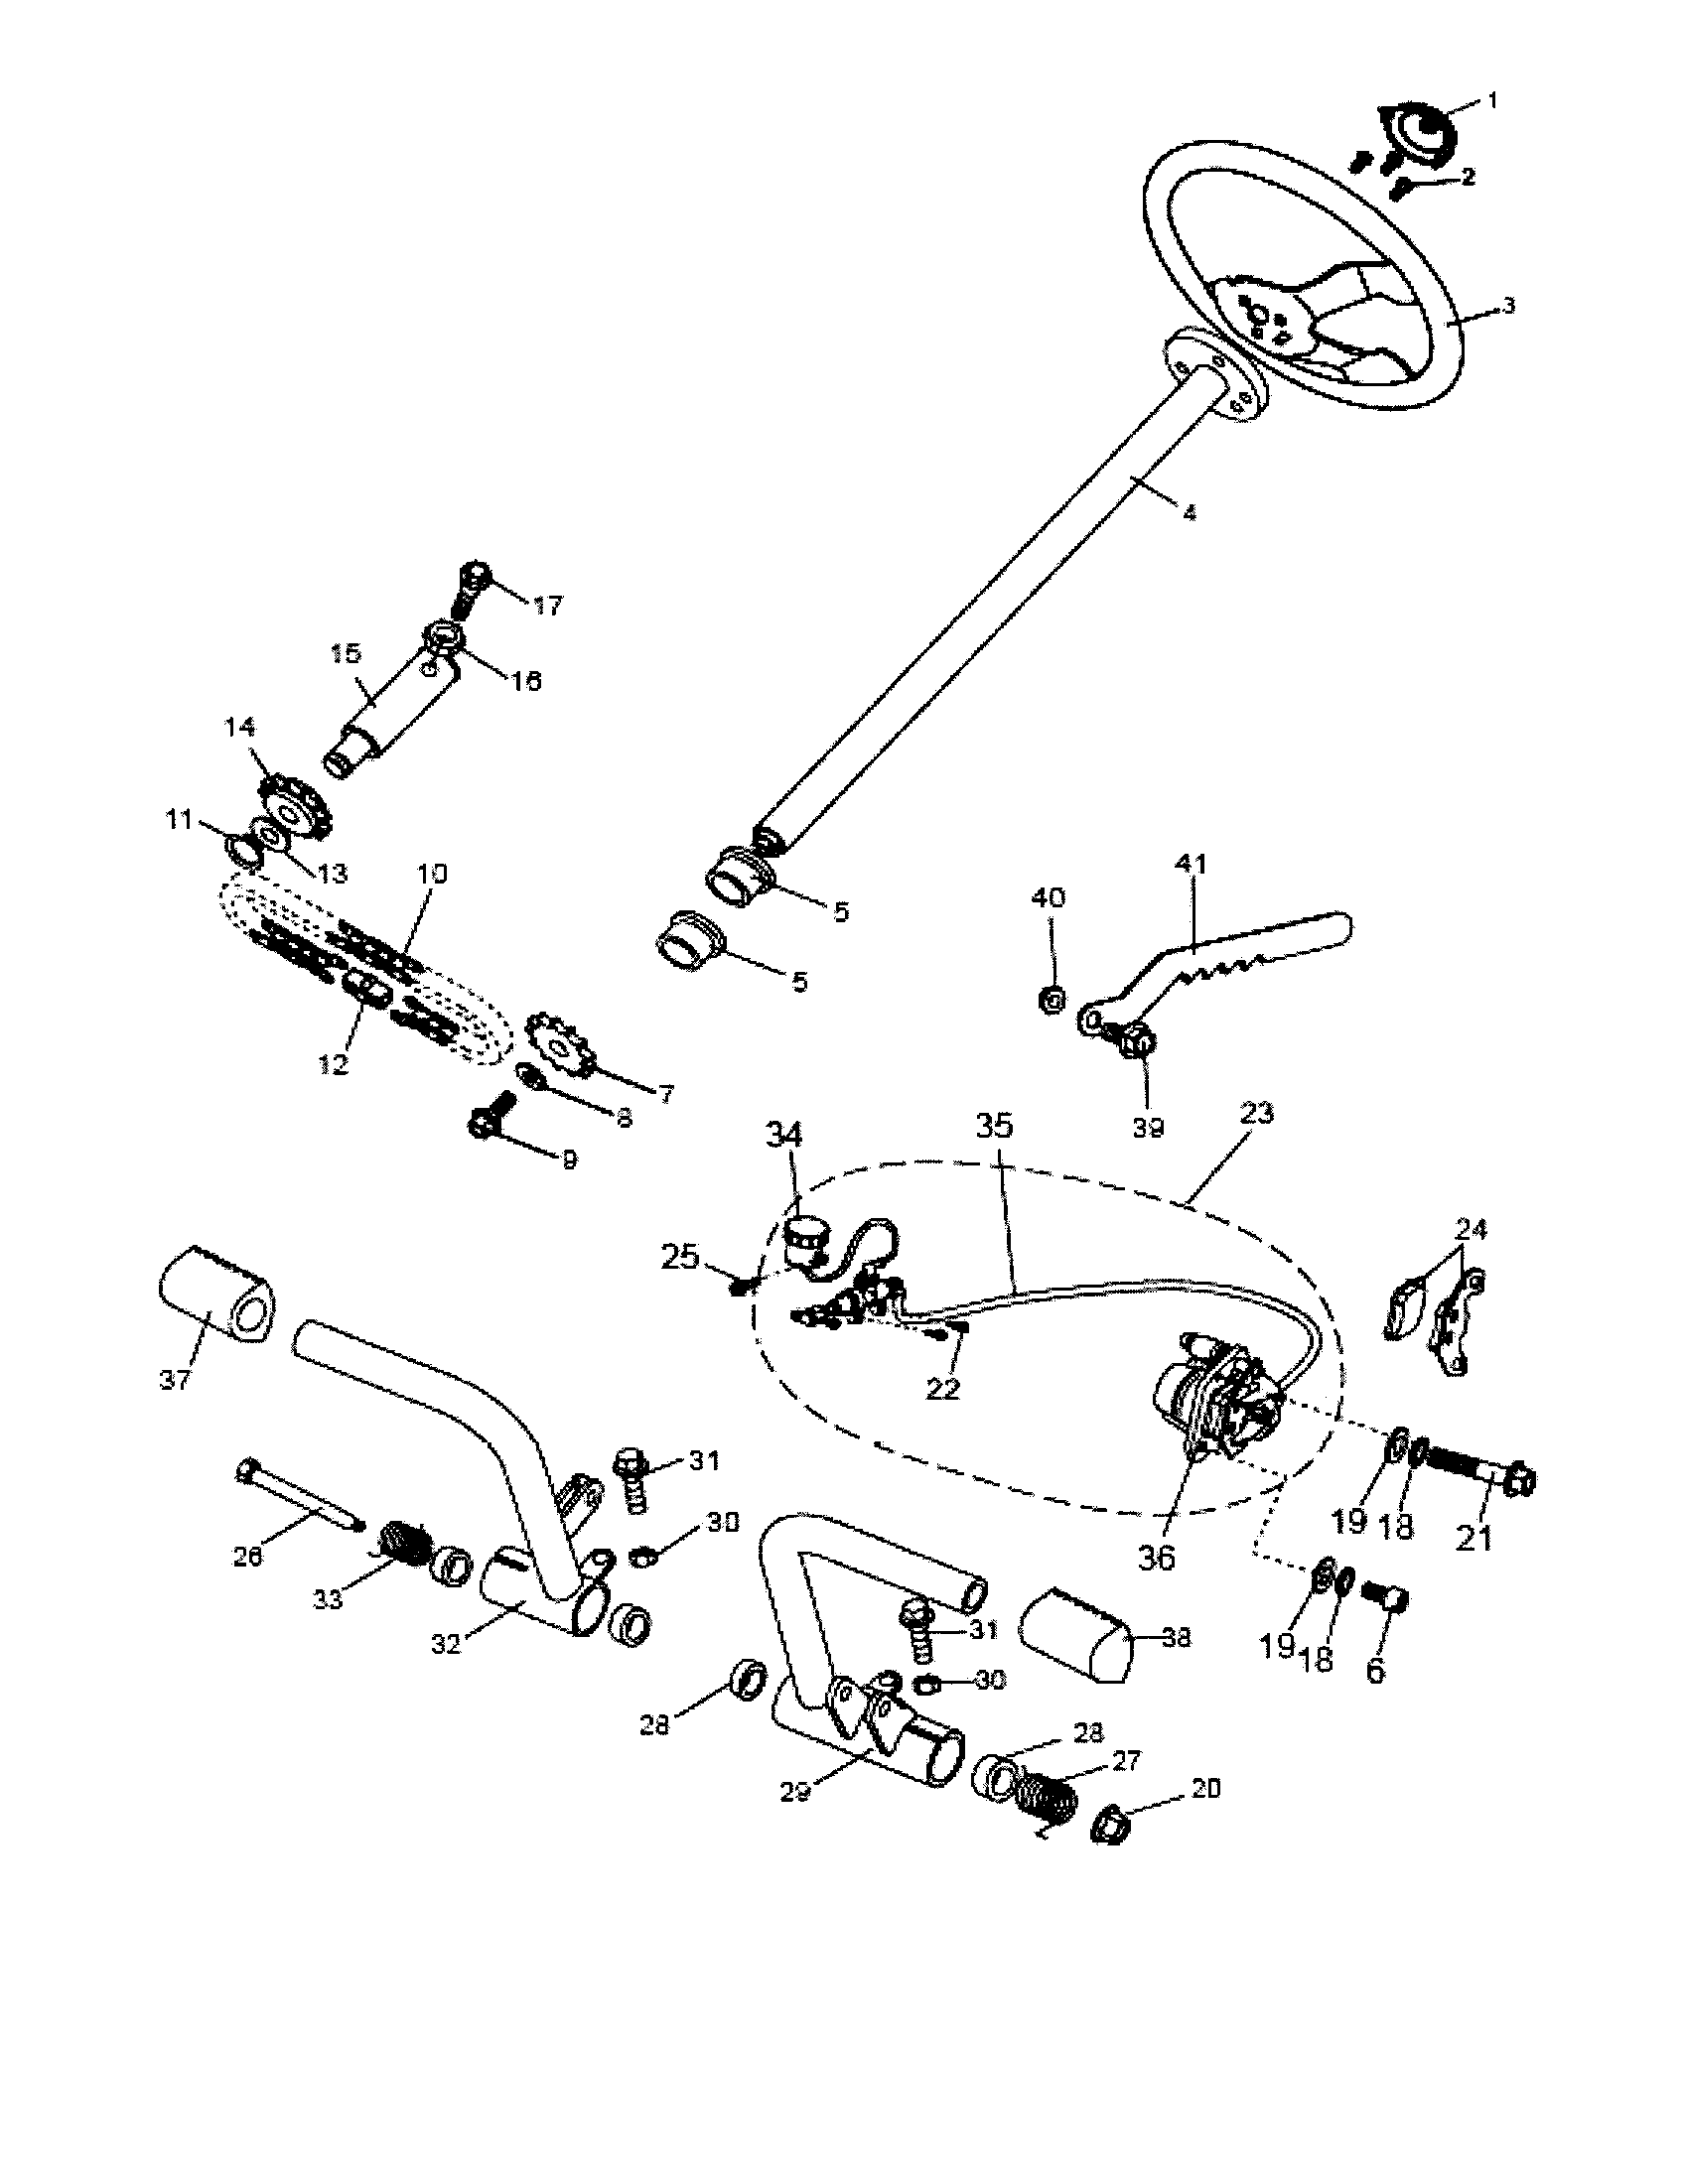 Manco model 6150 gokarts/minibikes genuine parts